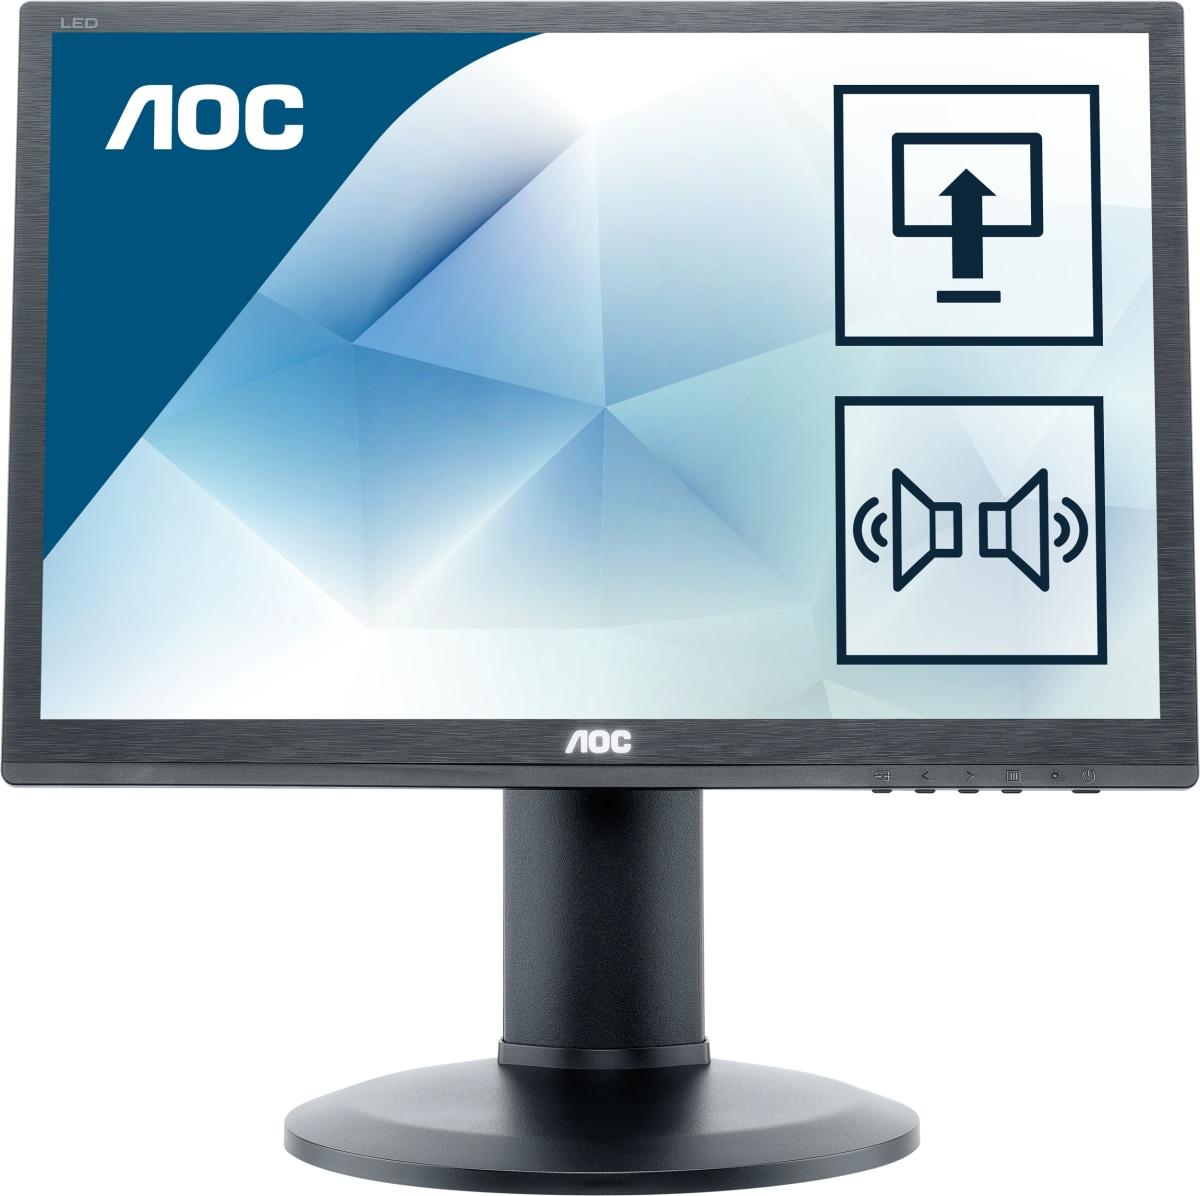 Monitor LCD 24in E2460pq/bk 1080p 60hz 250cd/m2 1000:1 2ms D-sub DVI-d Dp Black